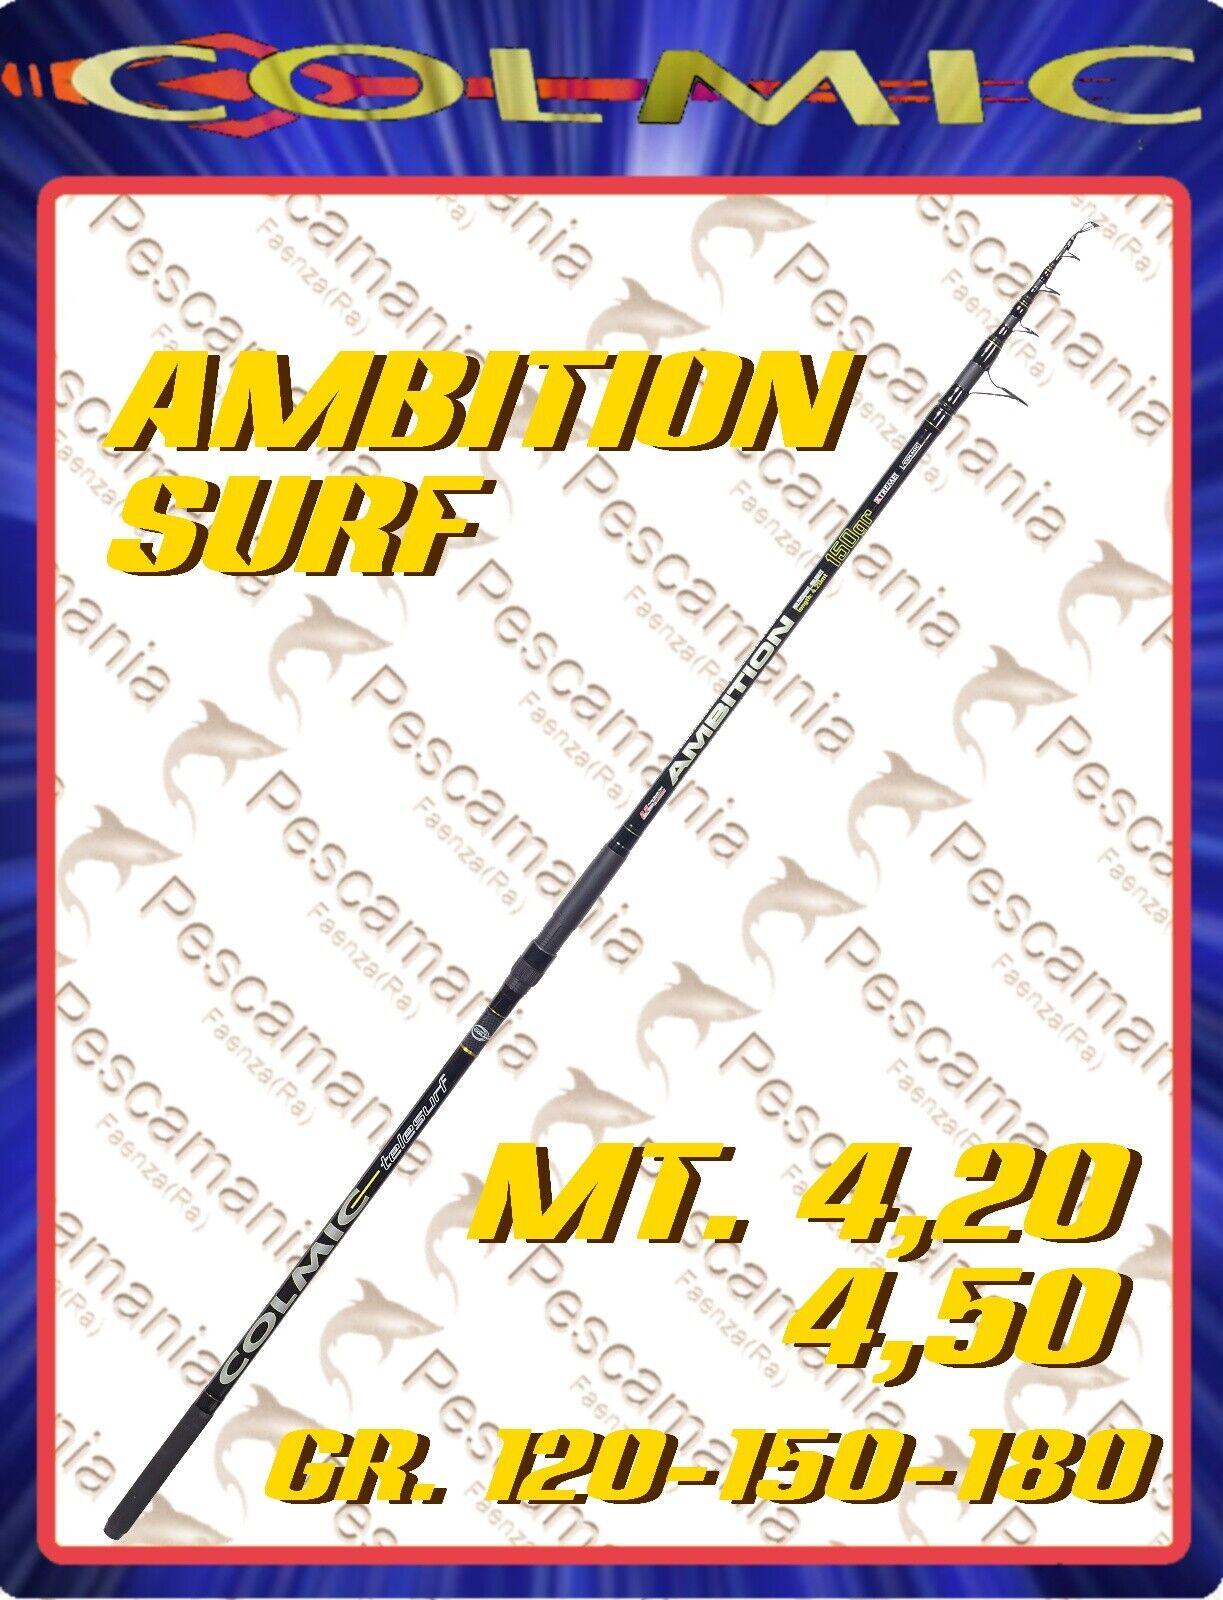 Canna colmic Ambition surf mt.4,20 mt 4.50 120-150-180 gr. surf casting